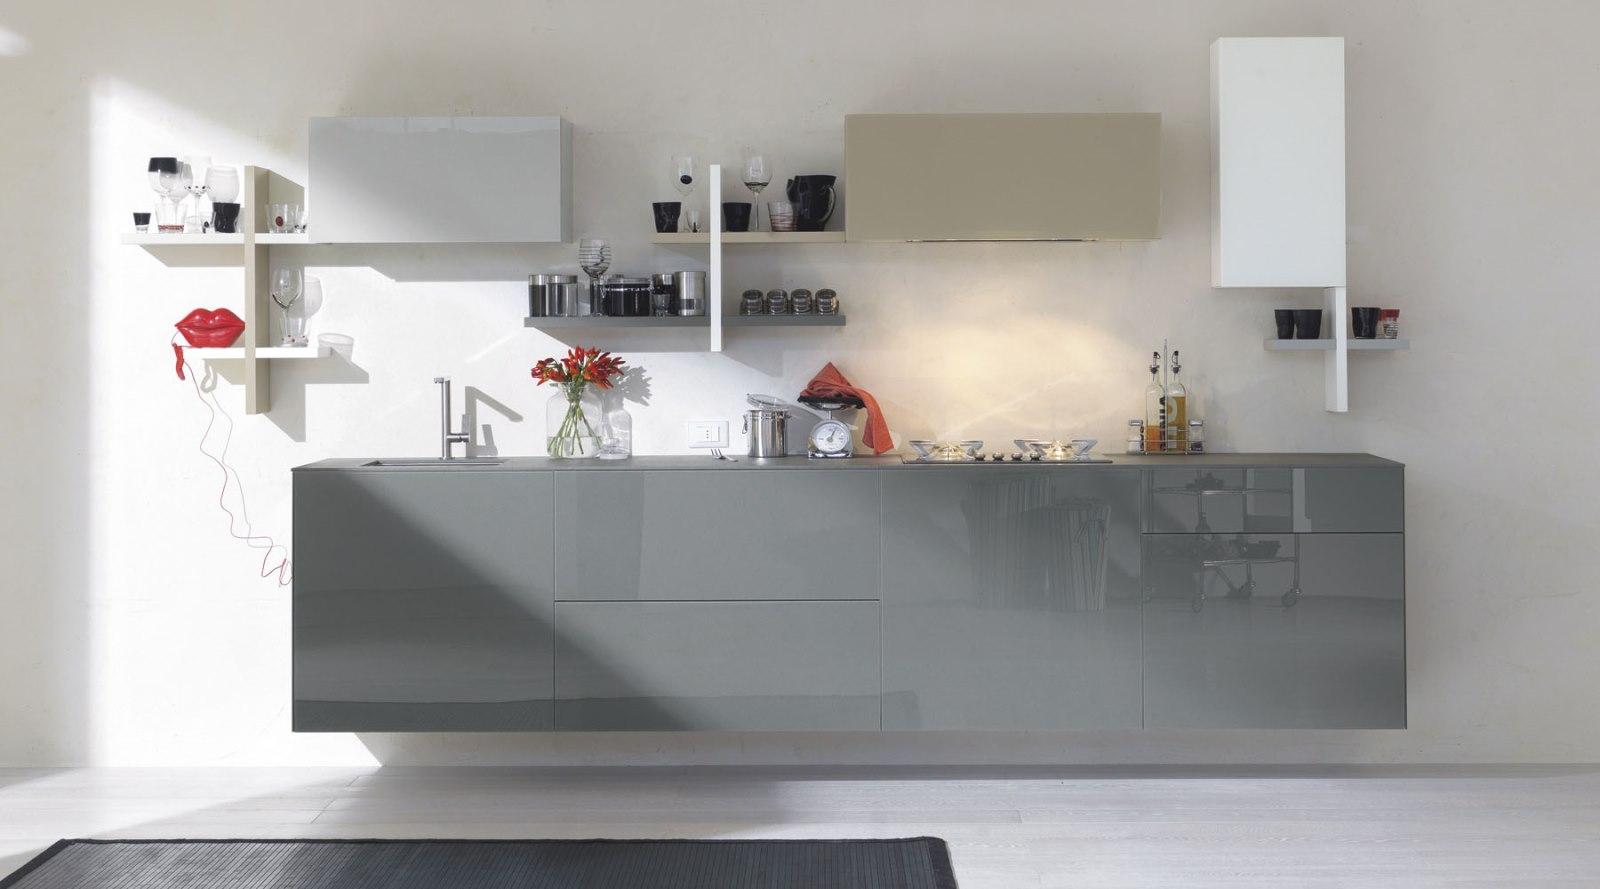 disegna la tua cucina stunning ordine with disegna la tua